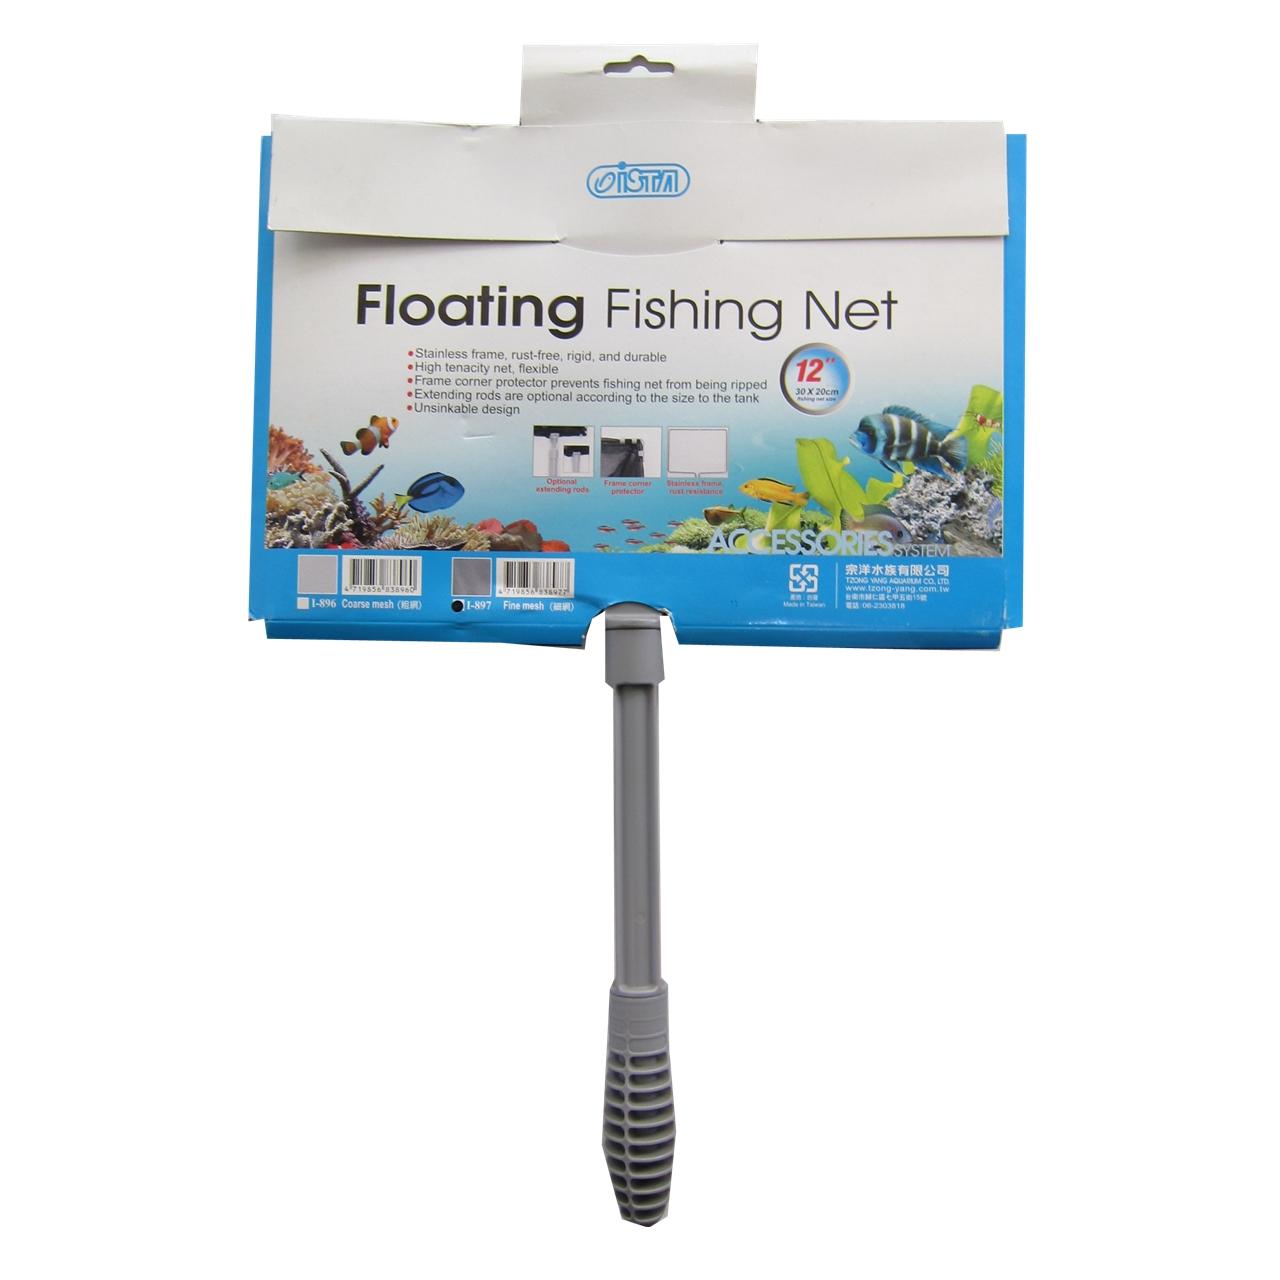 تور ماهی آکواریوم ایستا مدل Floating Fishing Net سایز ۱۲ اینچ